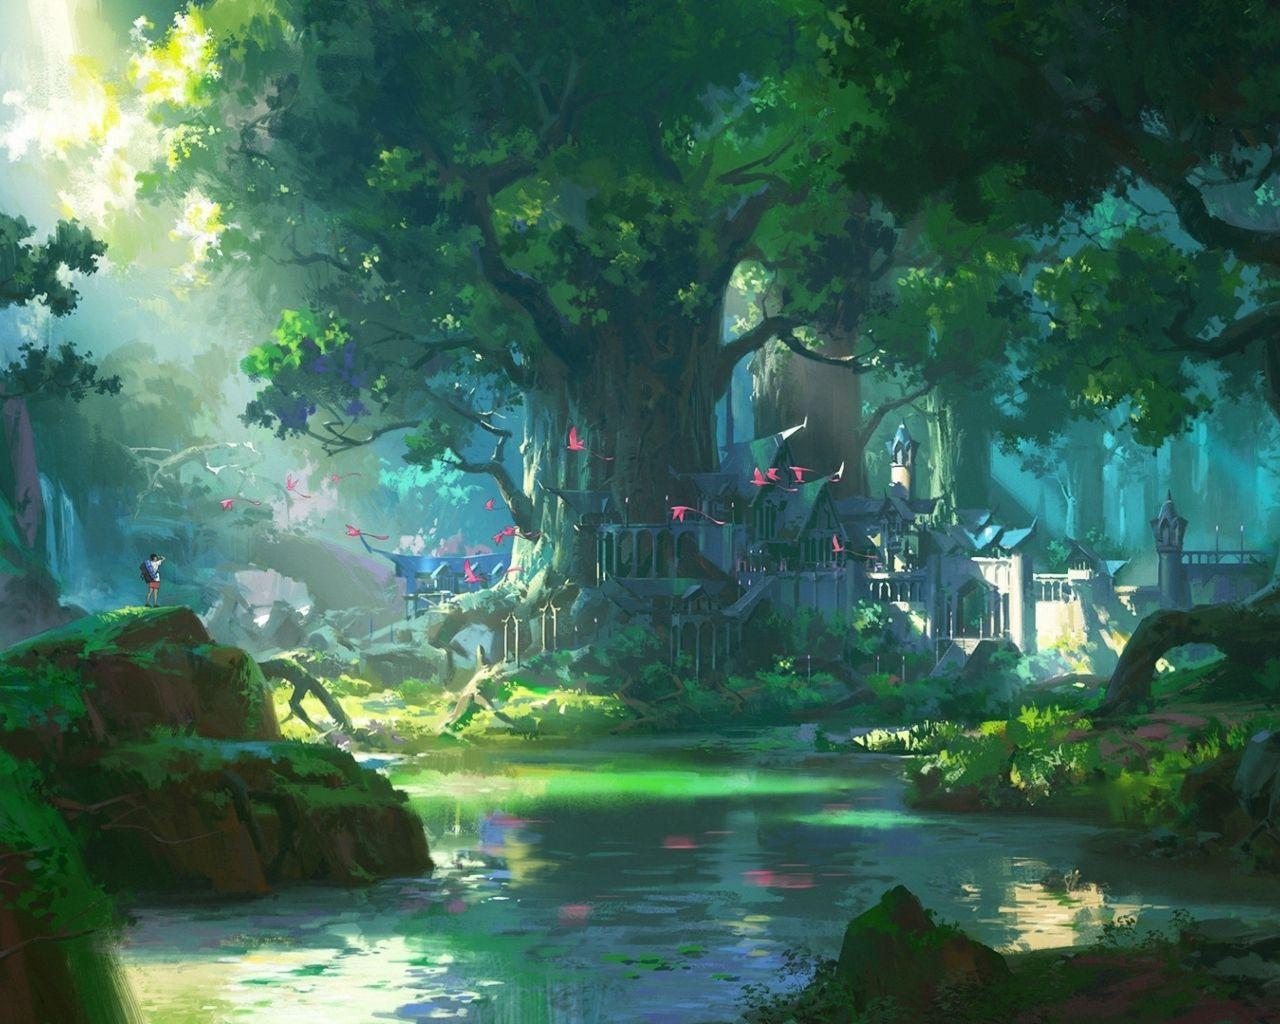 4k Anime Scenery Wallpapers - Top Free 4k Anime Scenery ...